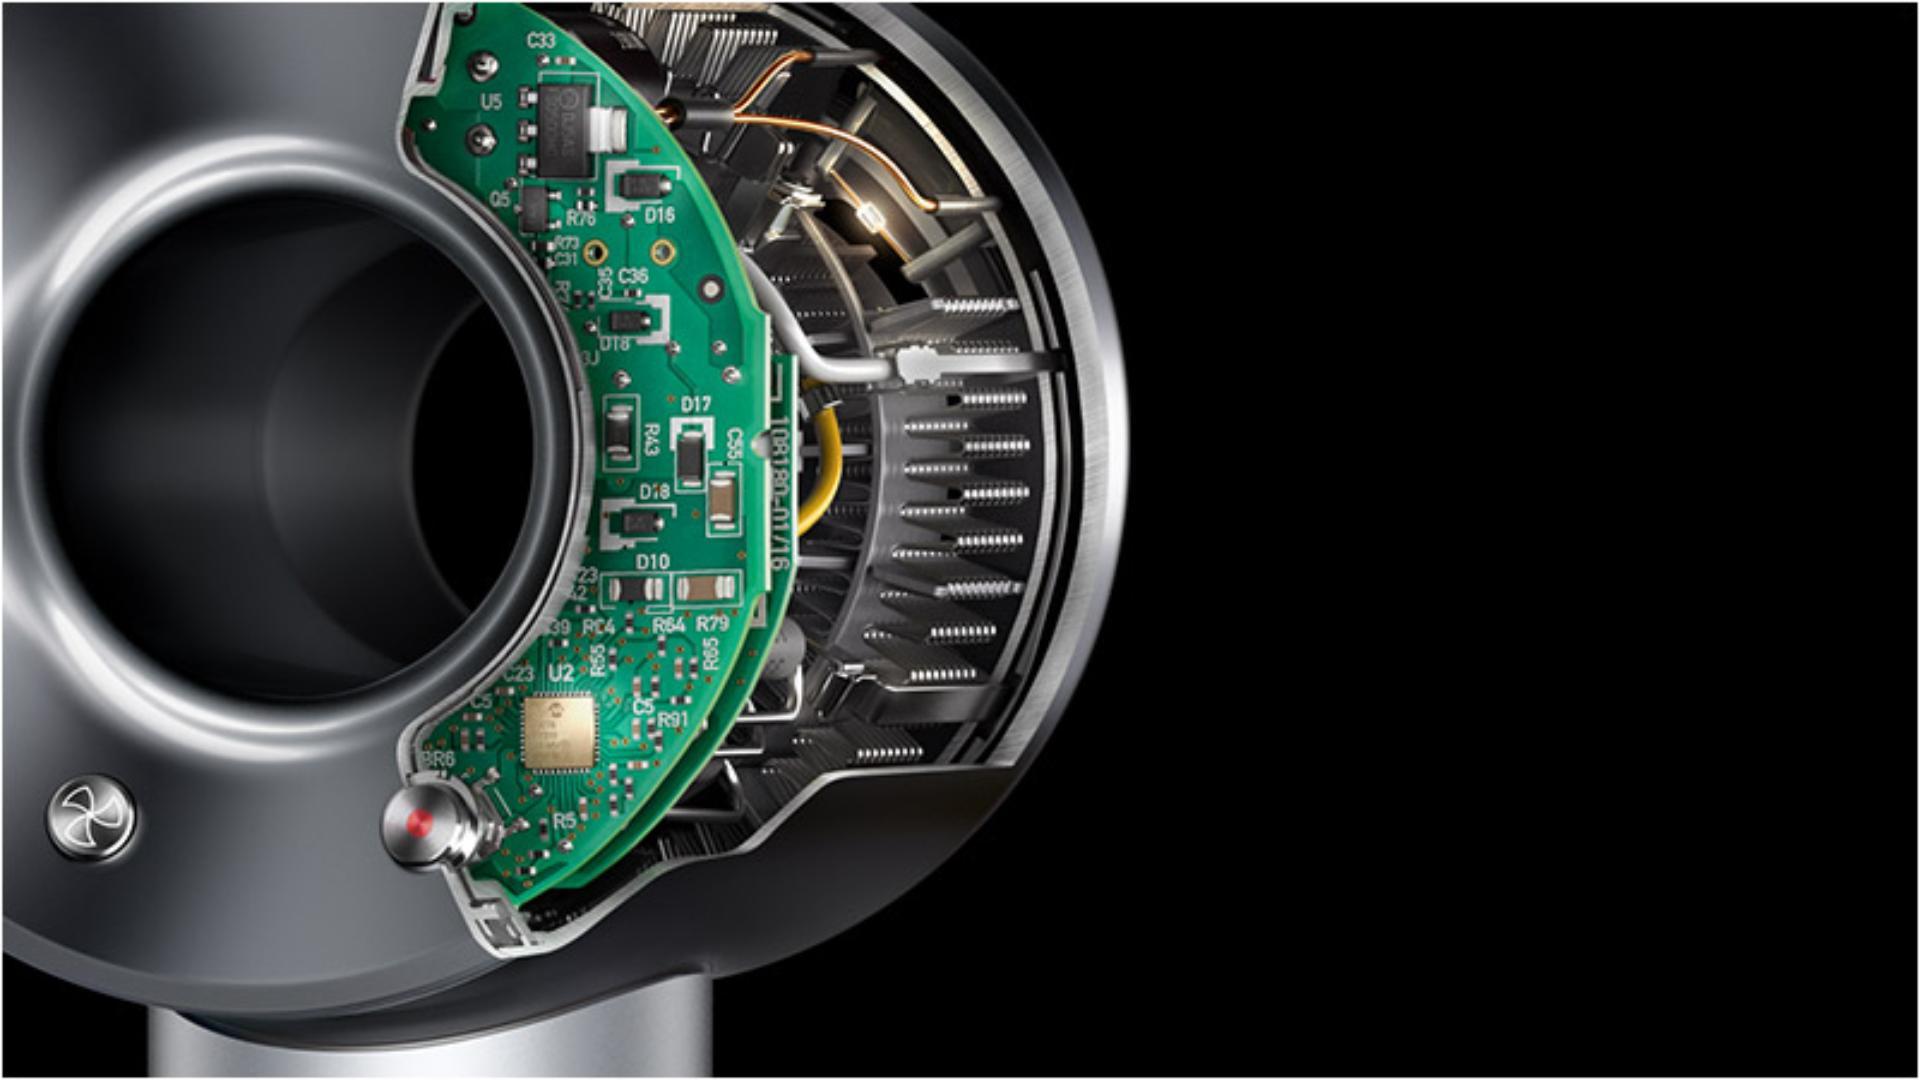 Dyson SupersonicTM saç kurutma makinesinin iç kesiti